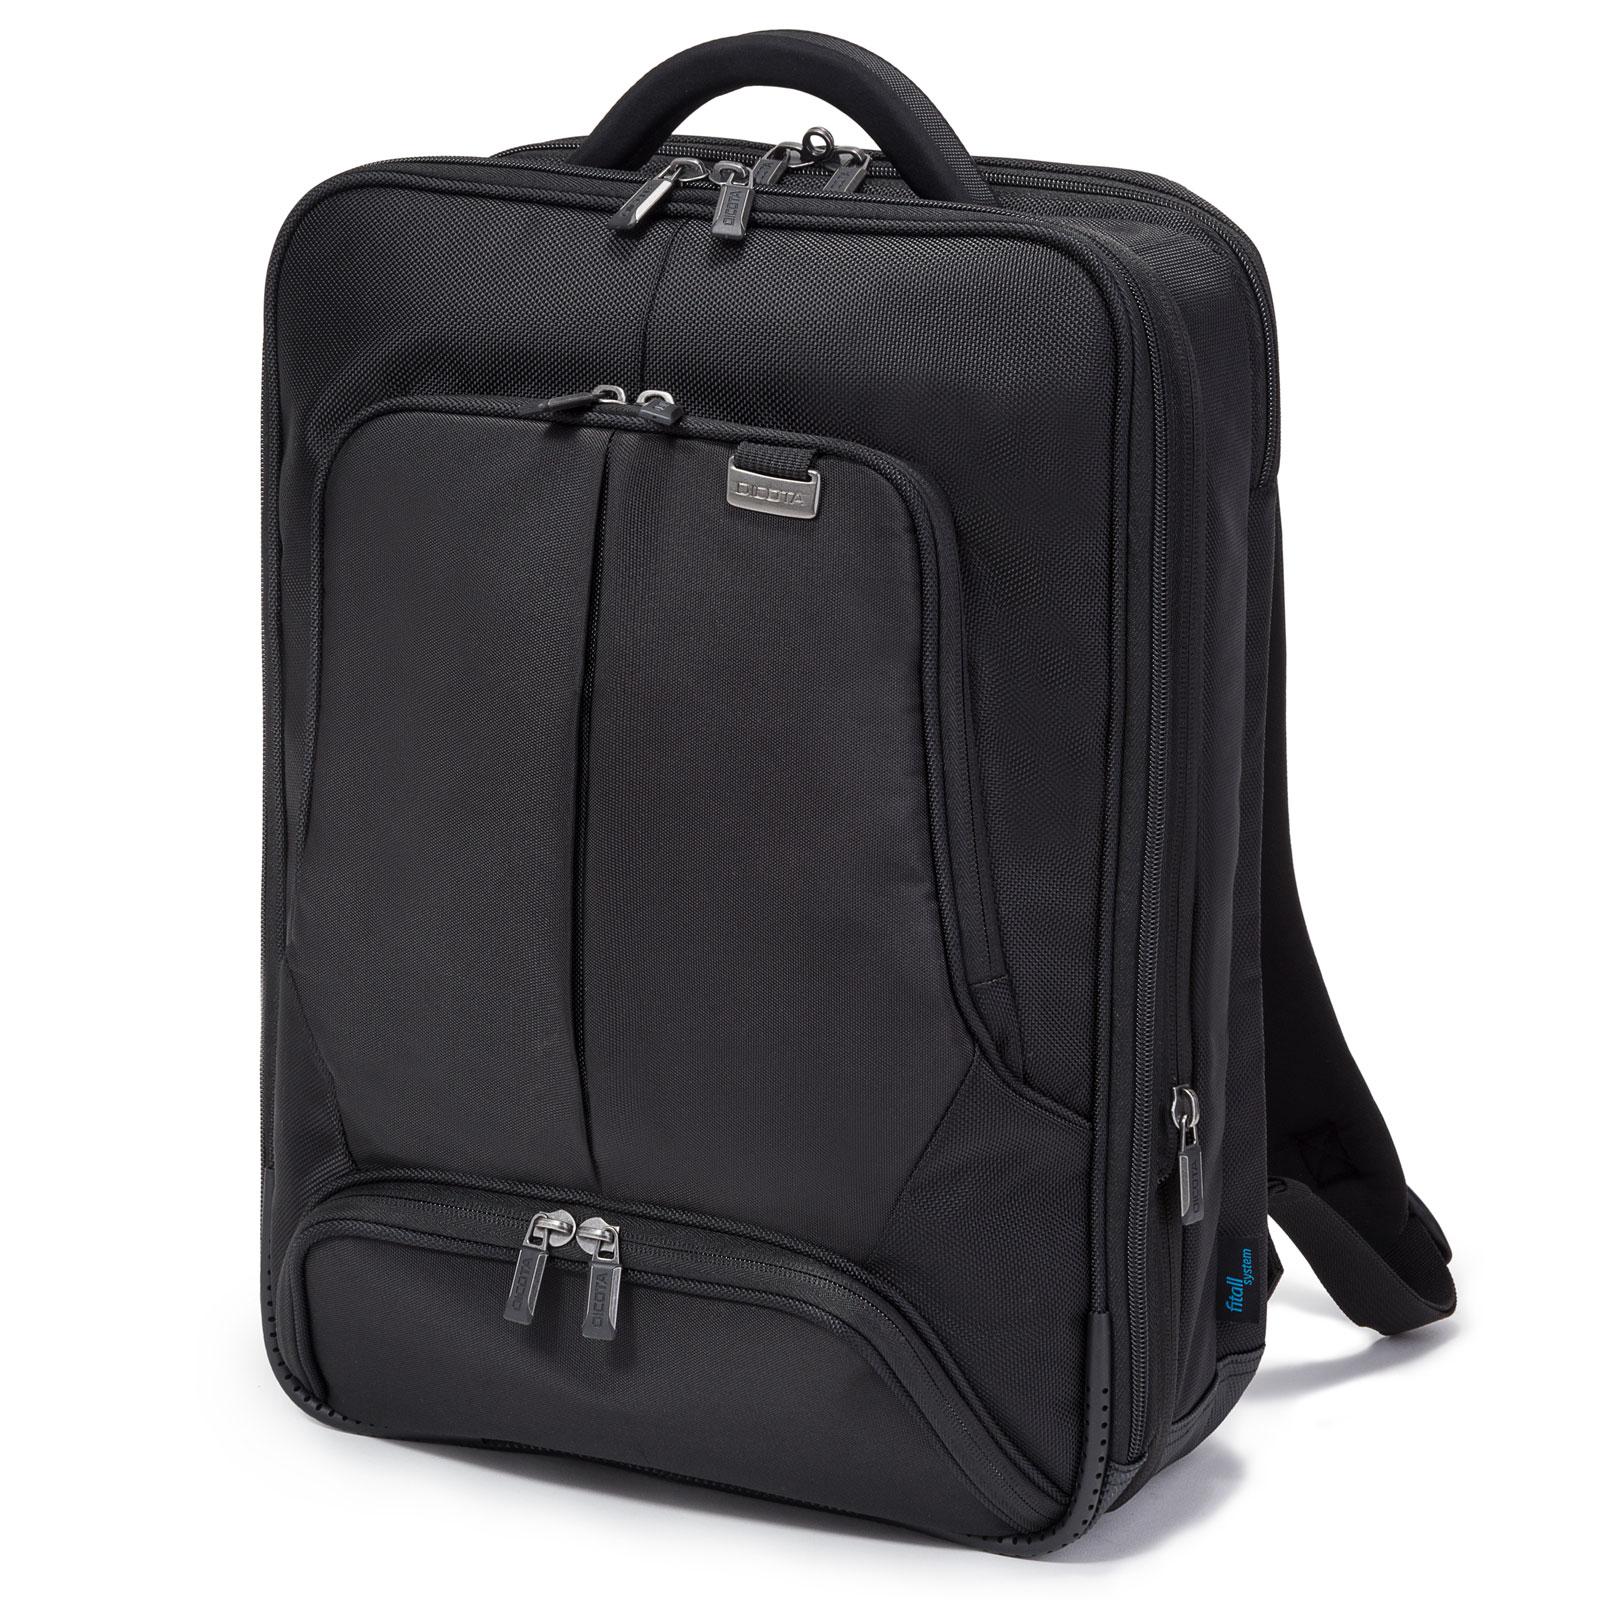 dicota backpack pro 12 14 1 sac sacoche housse dicota sur. Black Bedroom Furniture Sets. Home Design Ideas